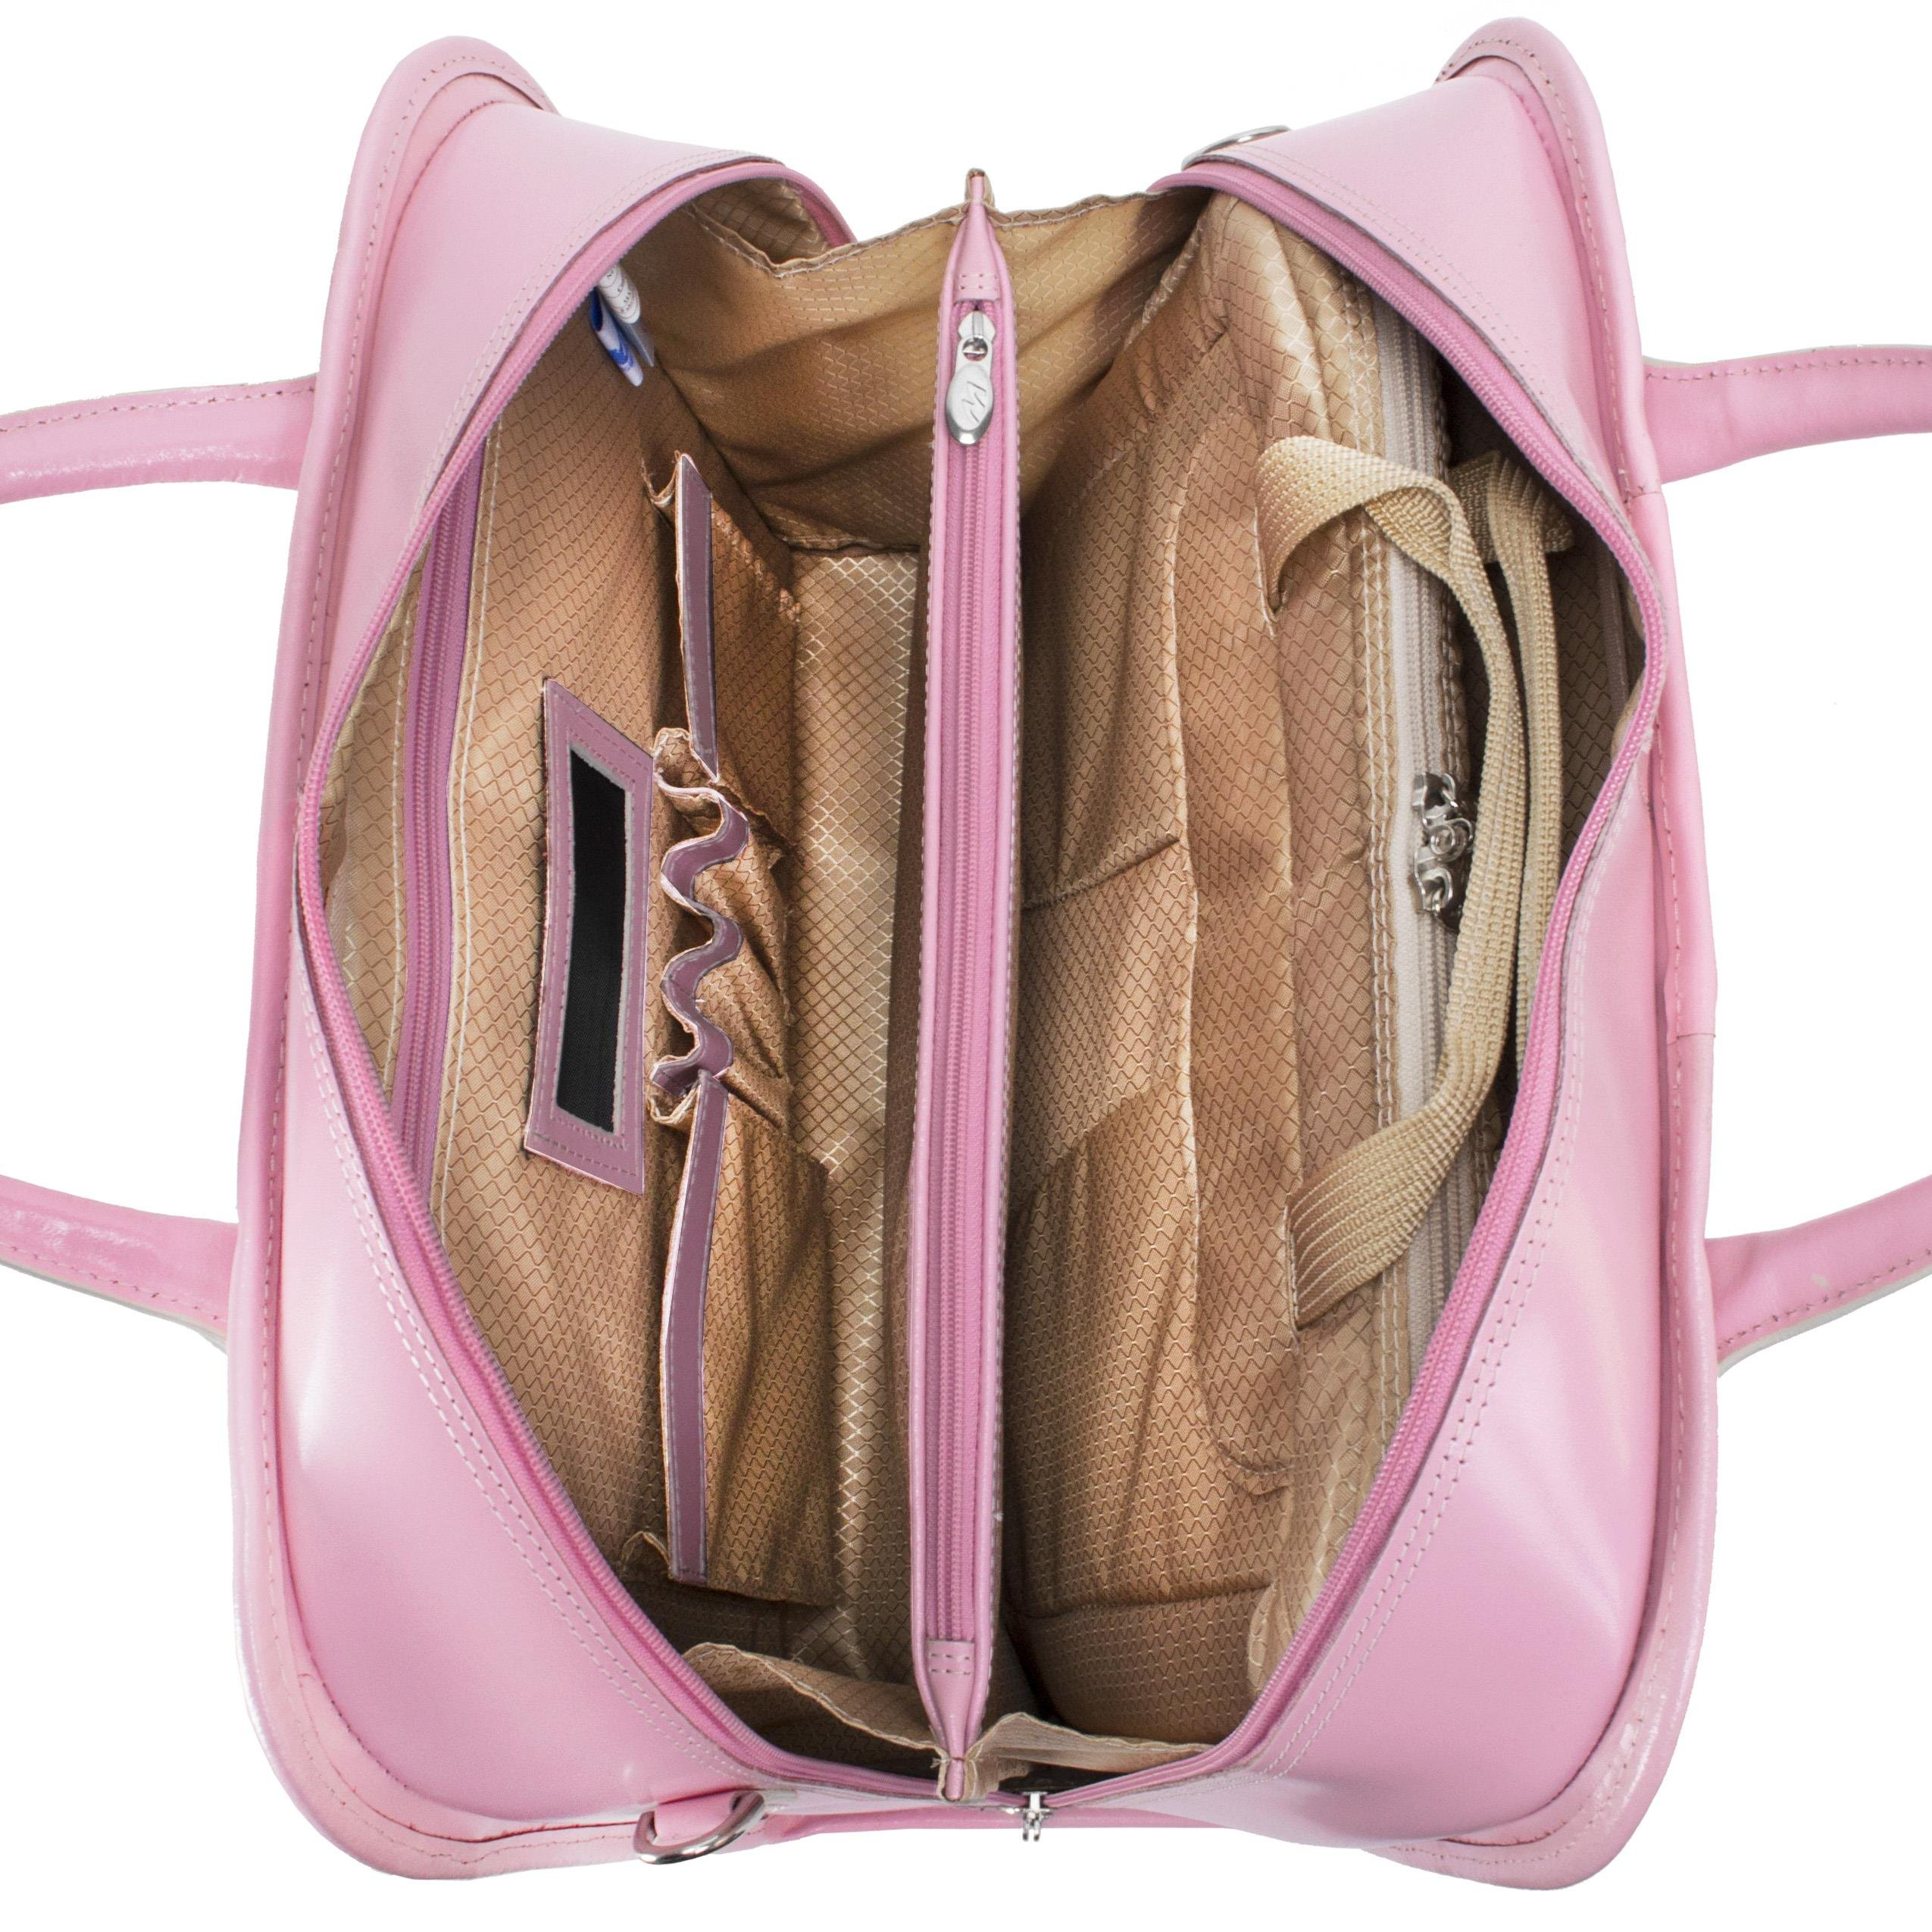 McKleinUSA LAKEWOOD 96615 Black Leather Fly-Through Checkpoint-Friendly Detachable-Wheeled Ladies' Briefcase by McKleinUSA (Image #8)